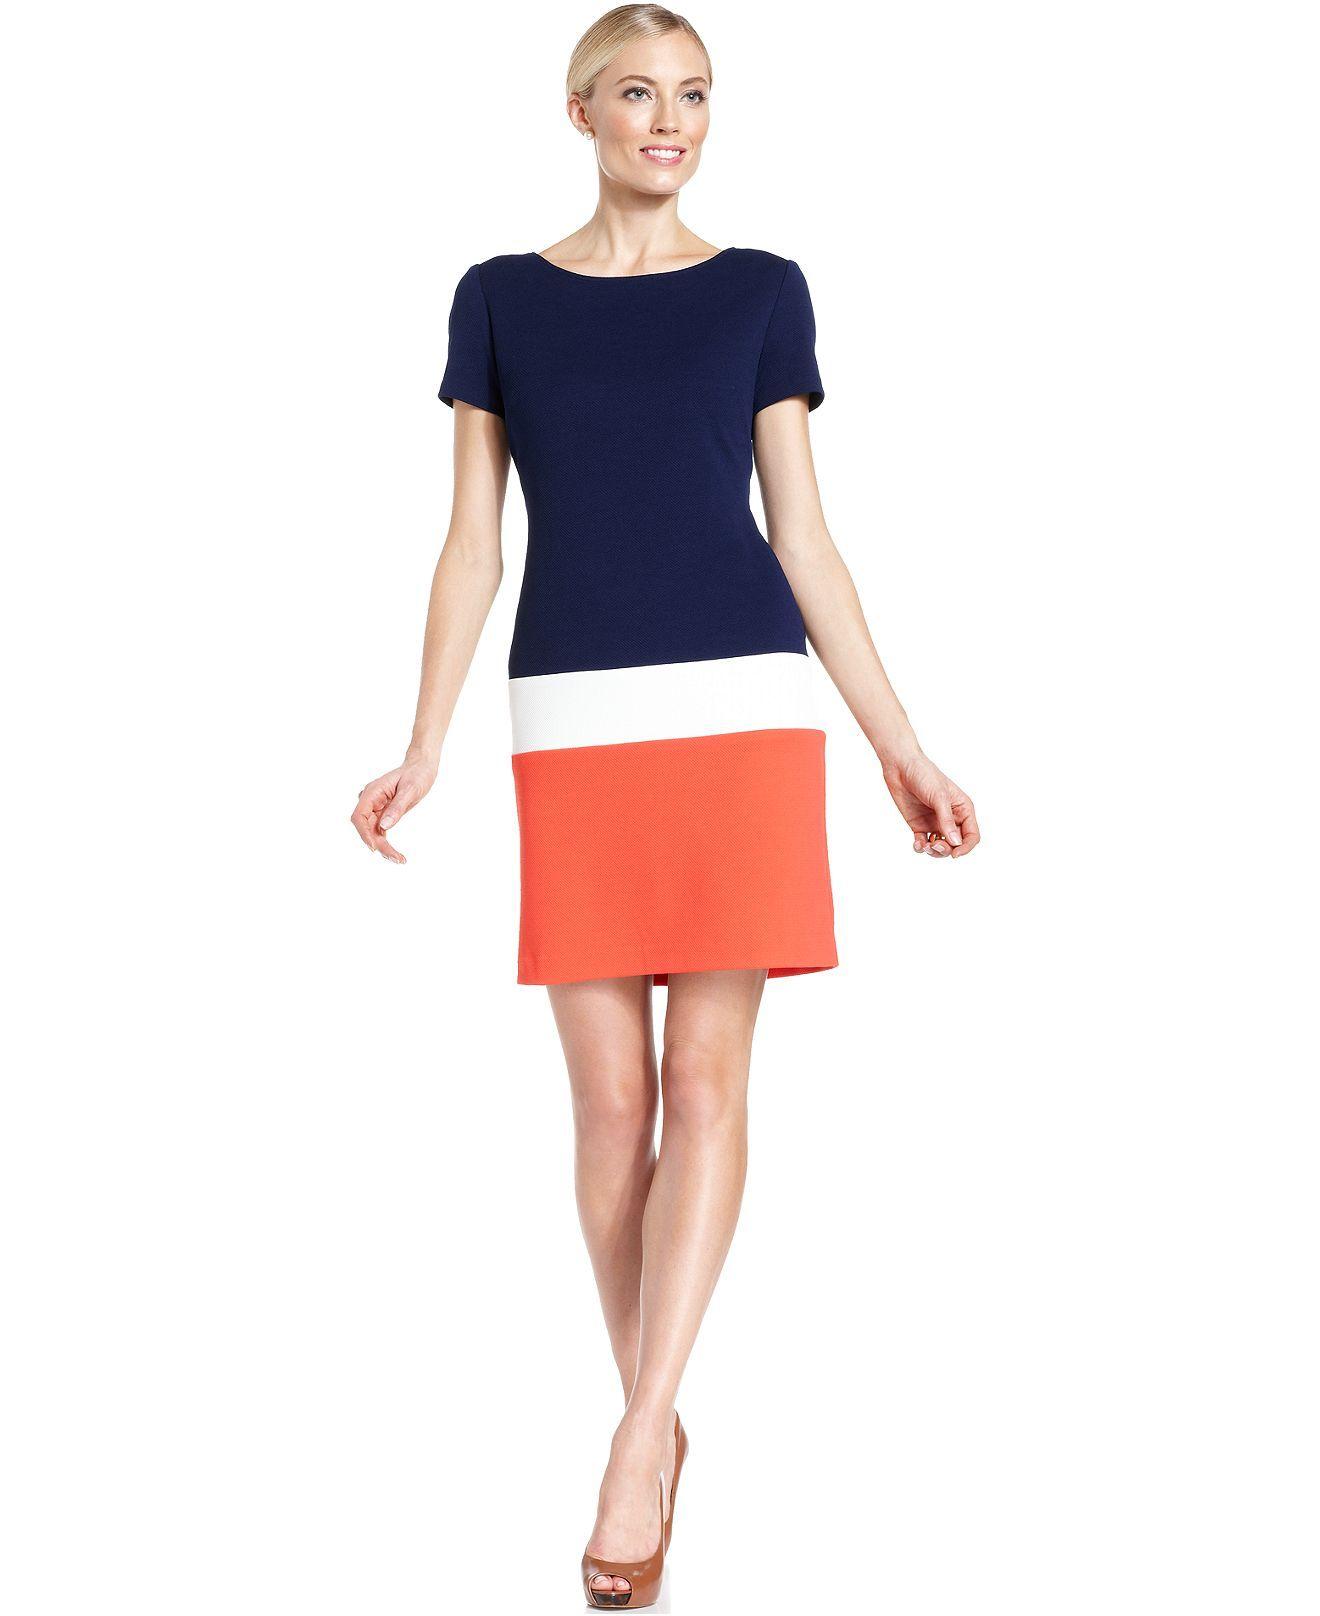 Ronni nicole shortsleeve colorblock dress dresses